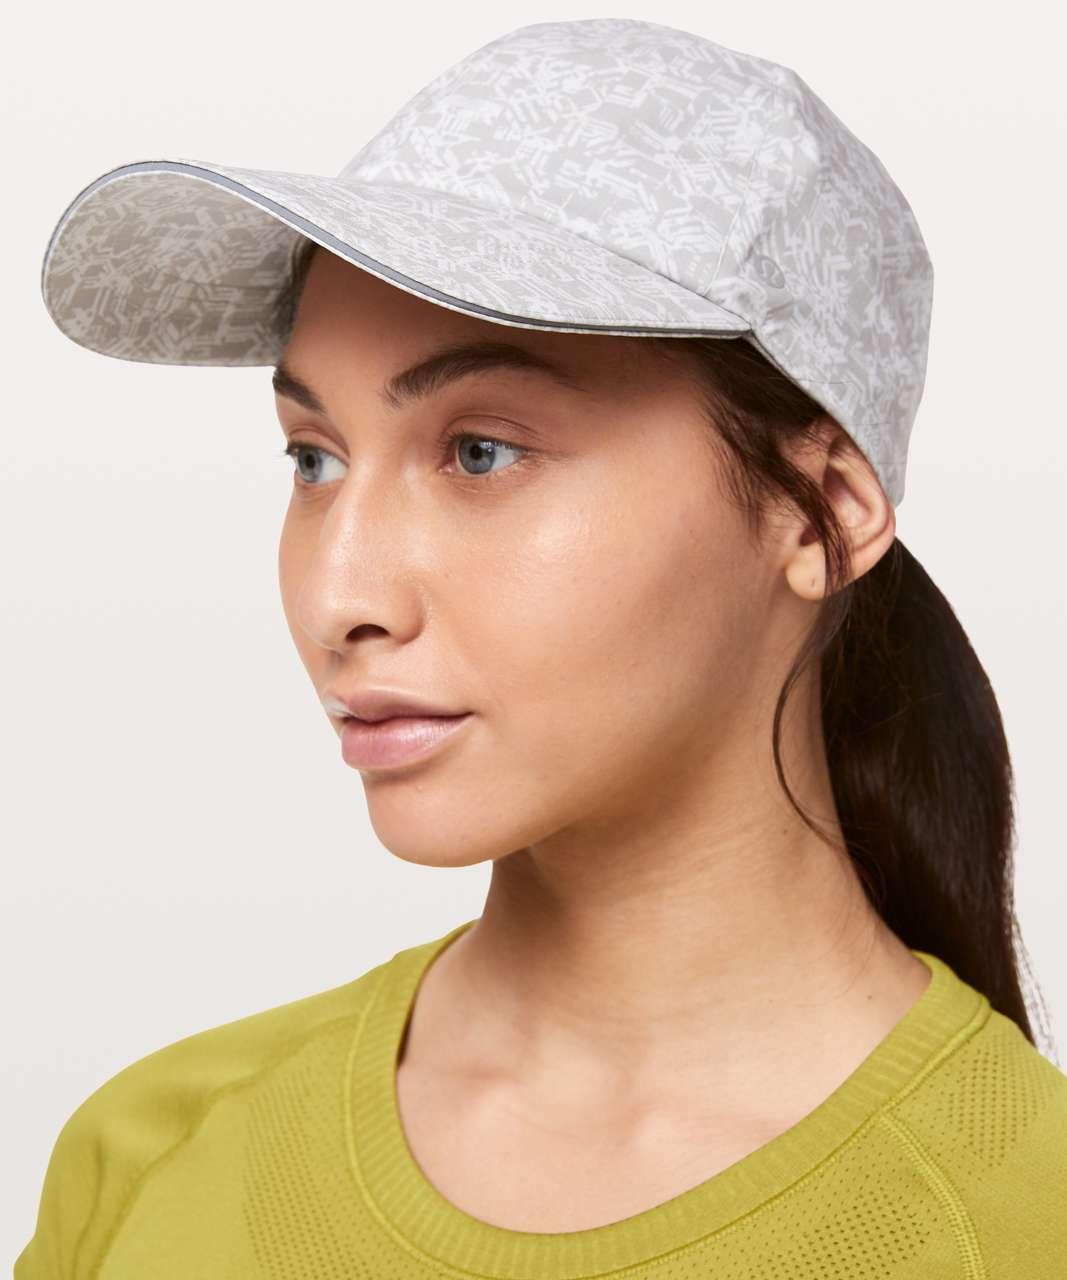 48f334c4 Lululemon Baller Hat Run - Prism Dash Alpine White French Clay - lulu  fanatics